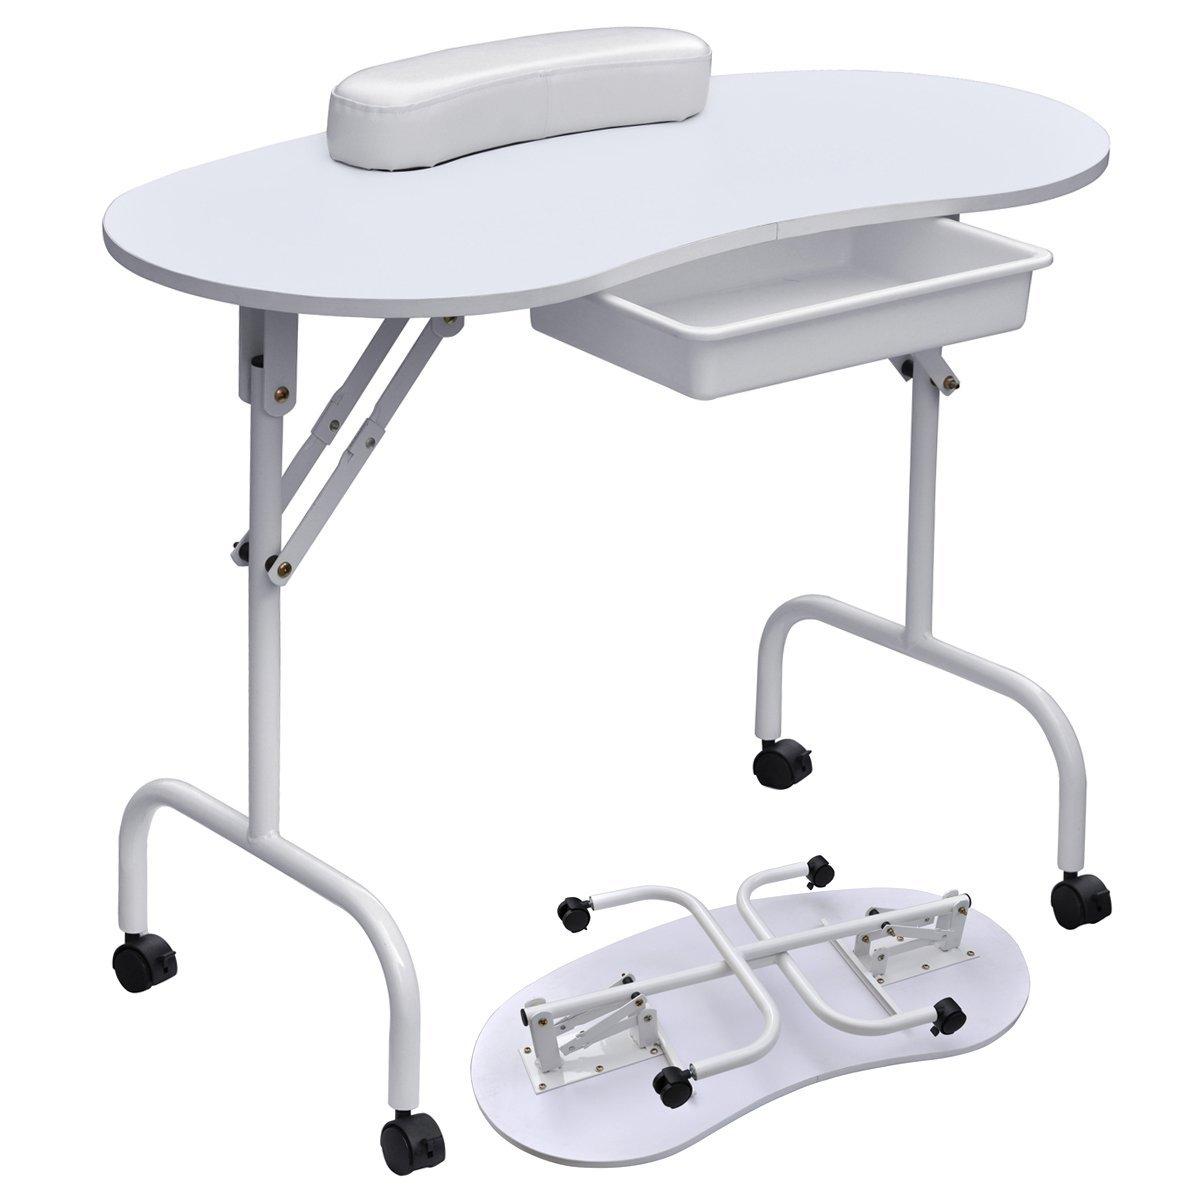 Amazon.com: Foldable u0026 Portable Manicure Table Nail Technician Desk  Workstation, White: Kitchen u0026 Dining